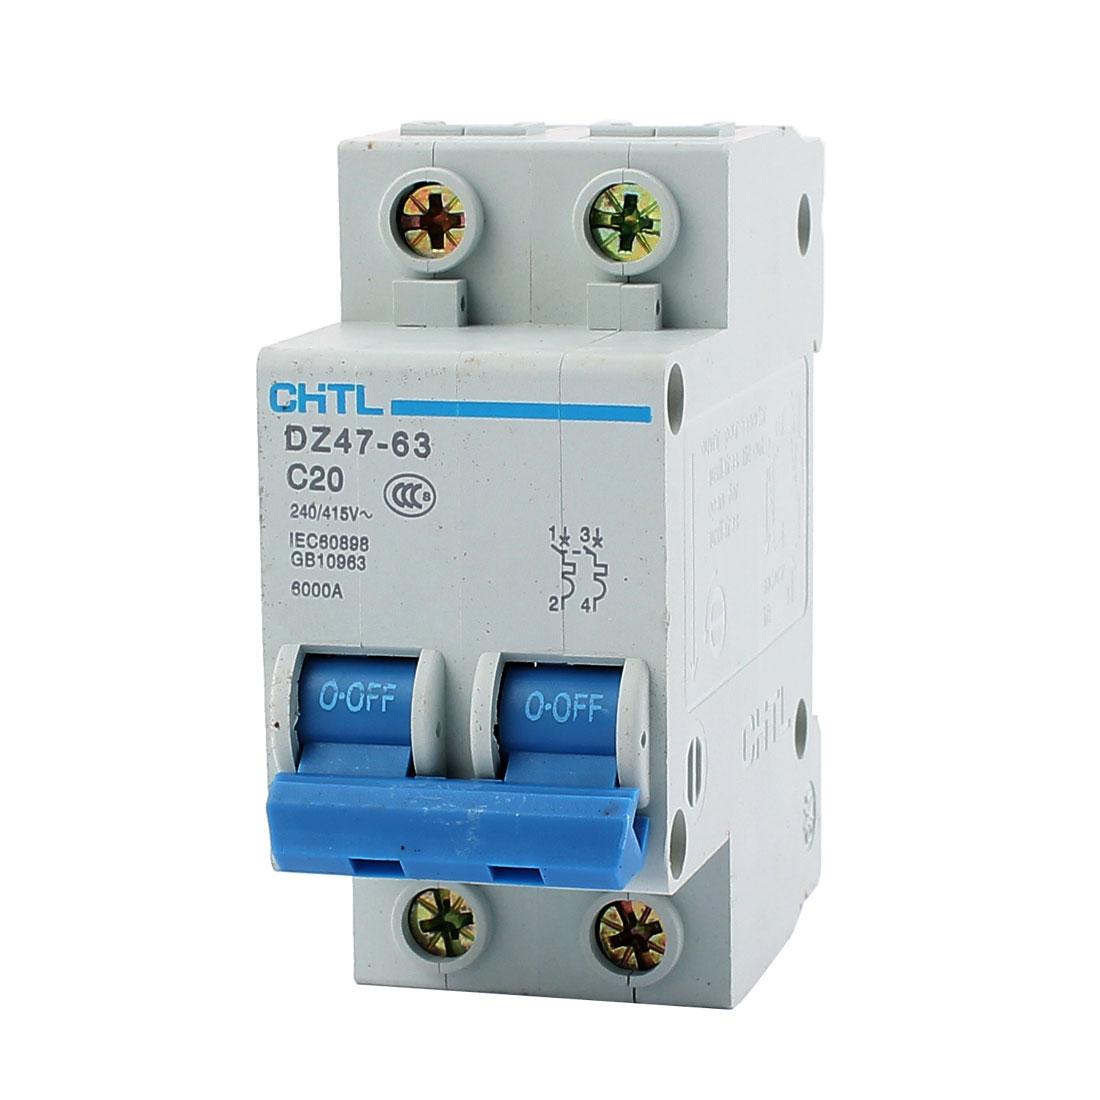 DZ47-63 C20 2 Pole Overload Miniature Circuit Breaker AC 240V/415V 20A